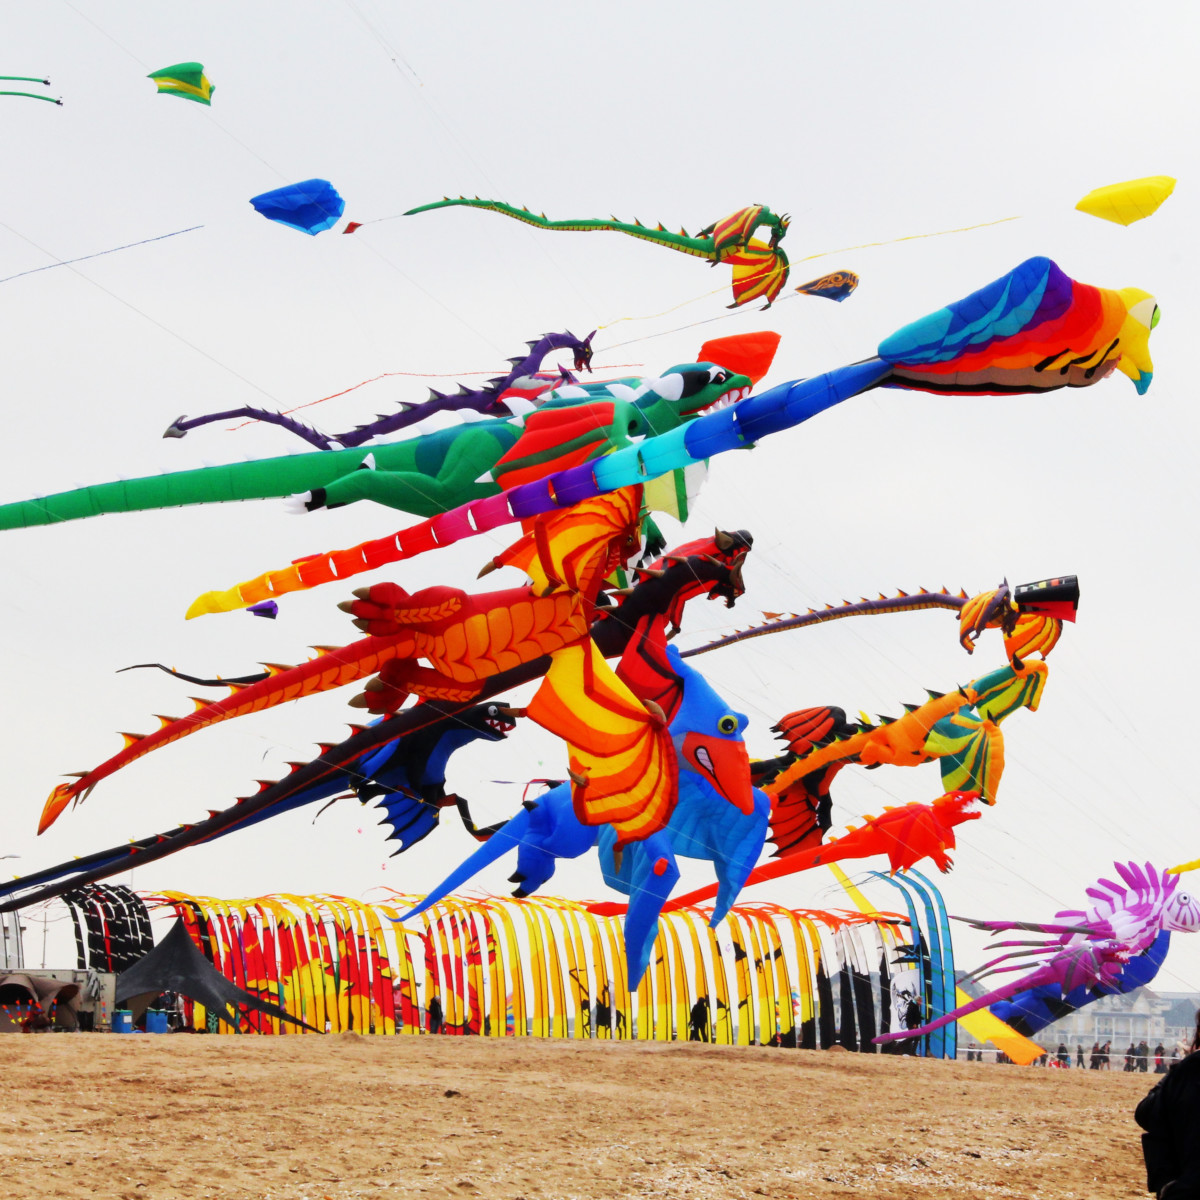 International Kite Festival of Gujarat India